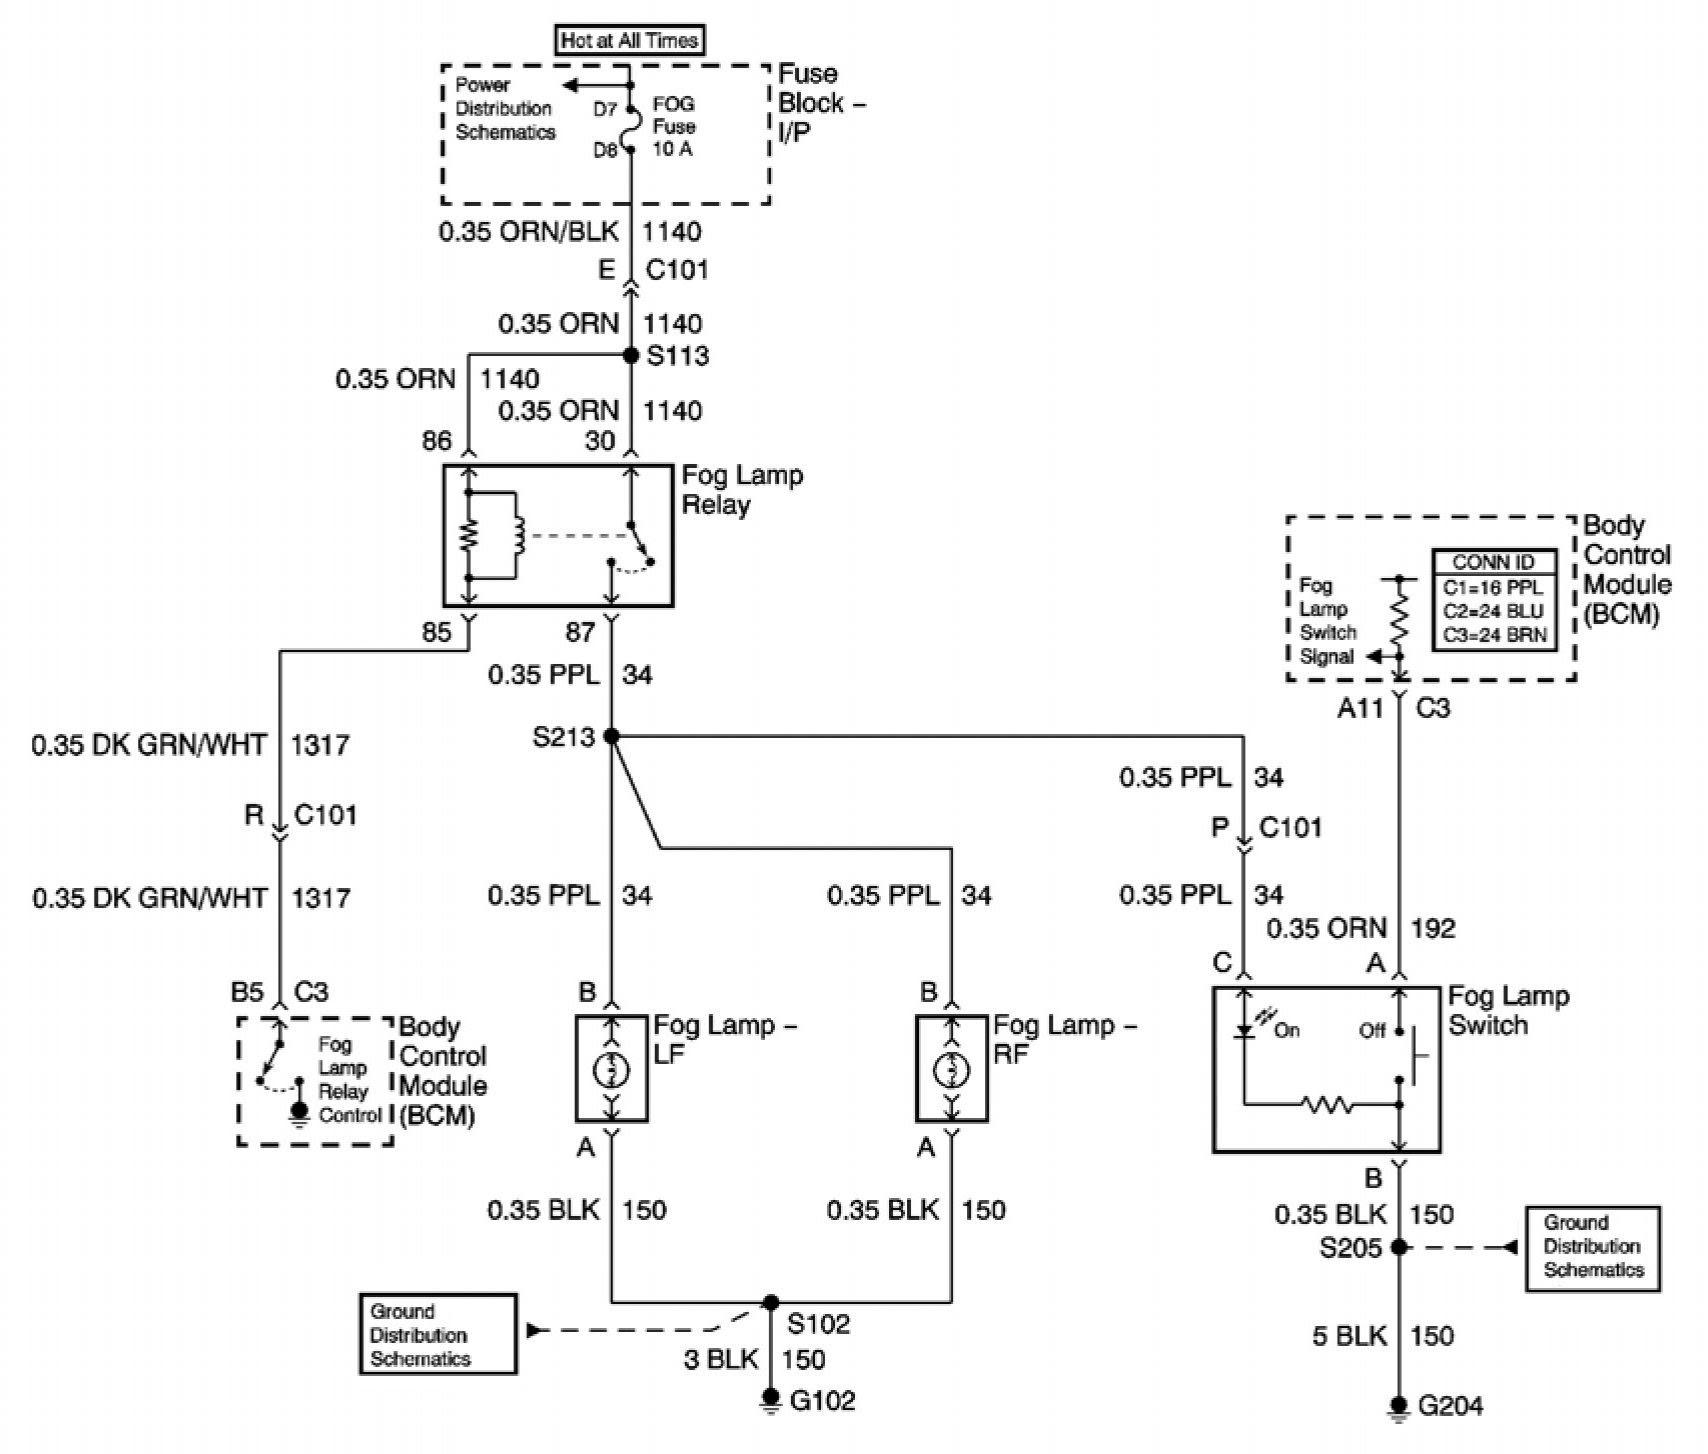 Diagram Wiring Diagram 2002 Pontiac Sunfire Full Version Hd Quality Pontiac Sunfire Diagramnebelj Nowroma It